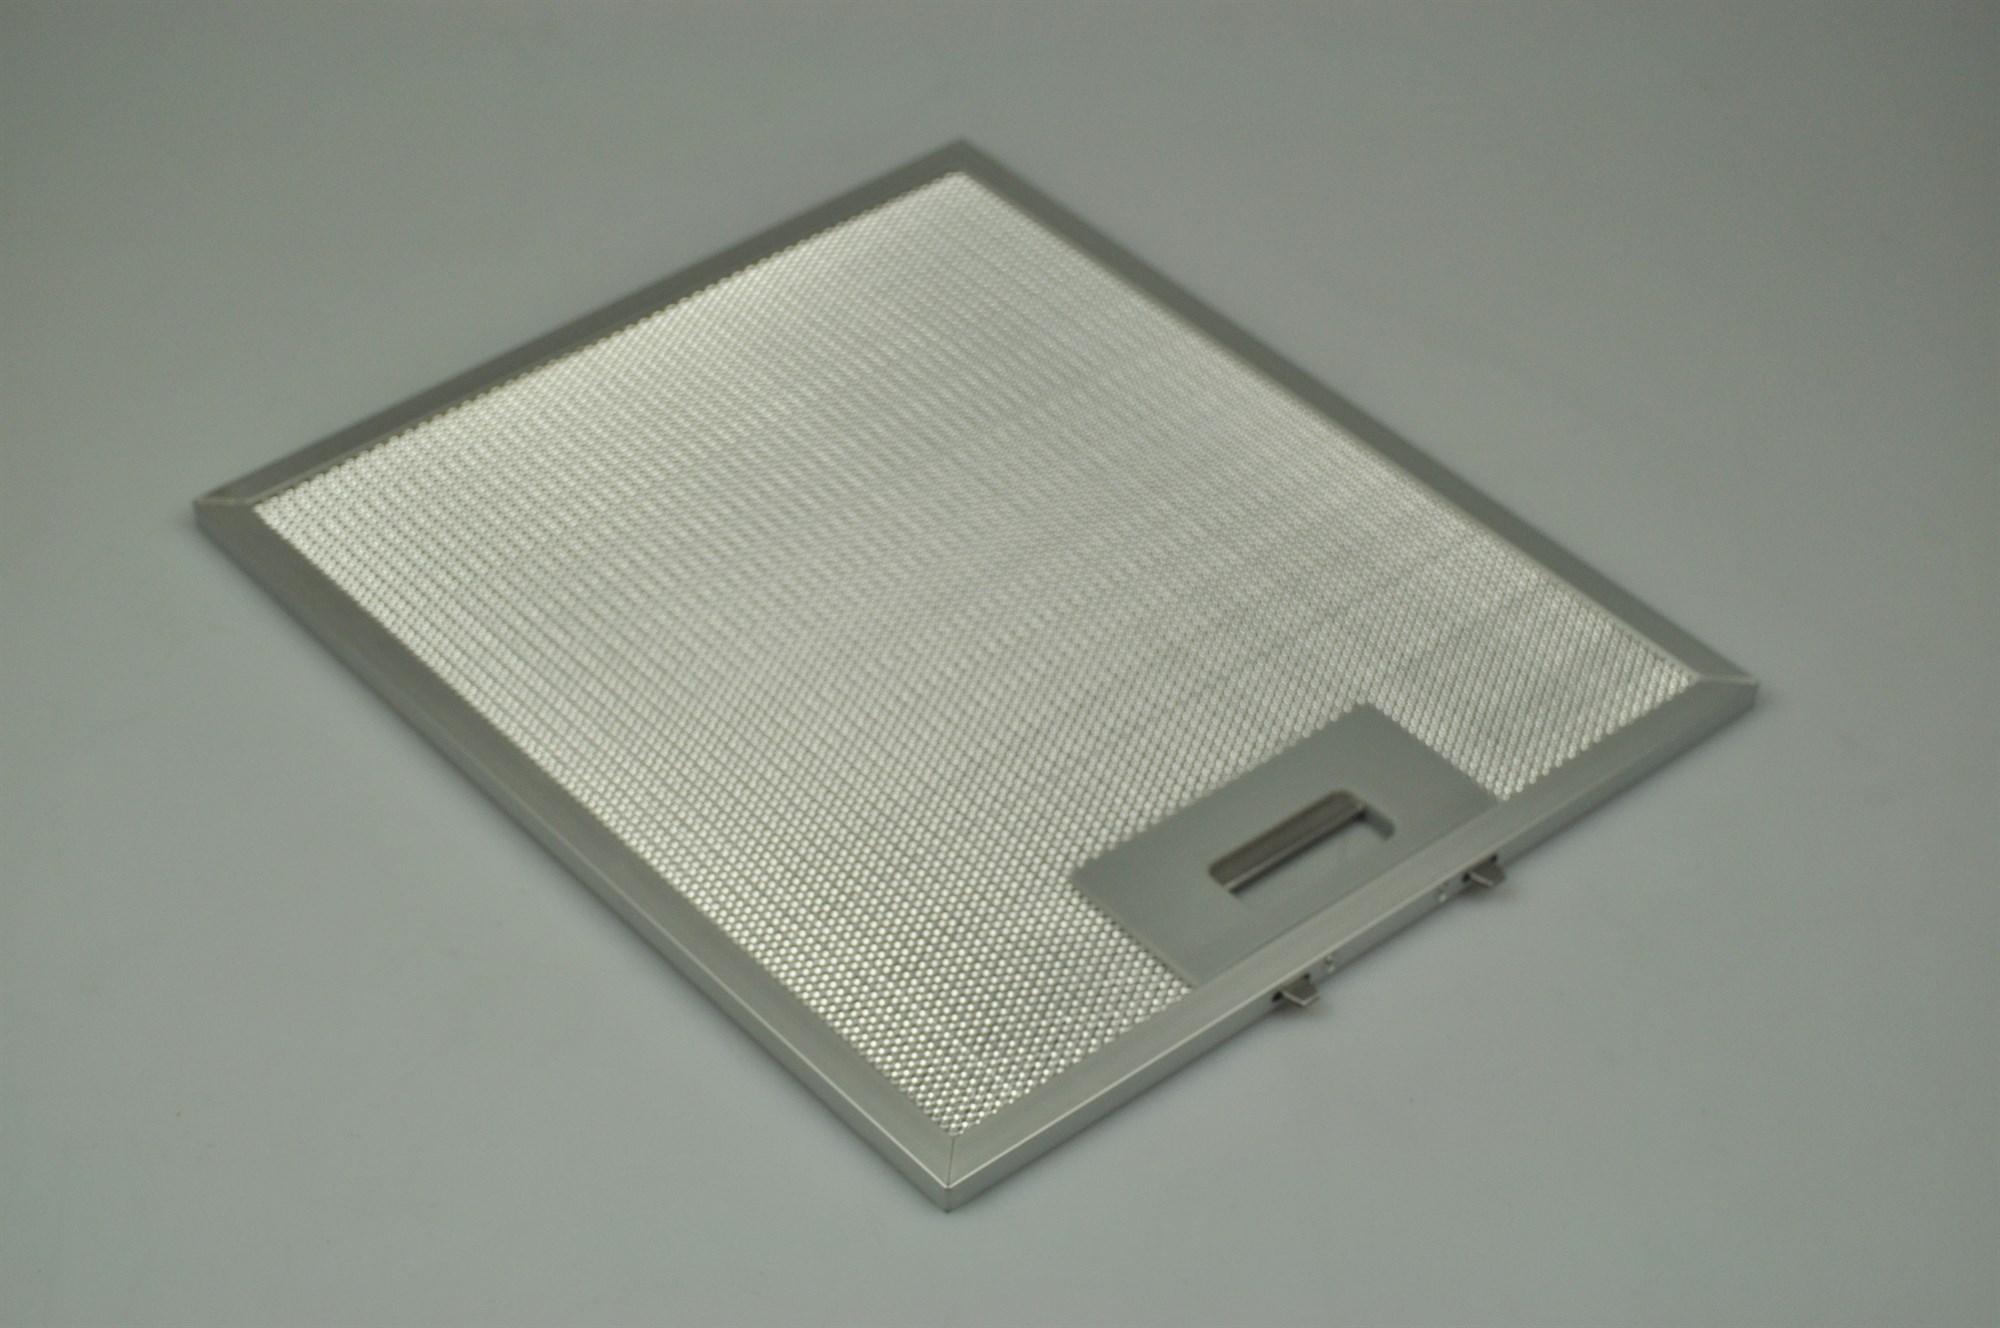 Metallfilter asko dunstabzugshaube 295x250x7 mm fettfilter